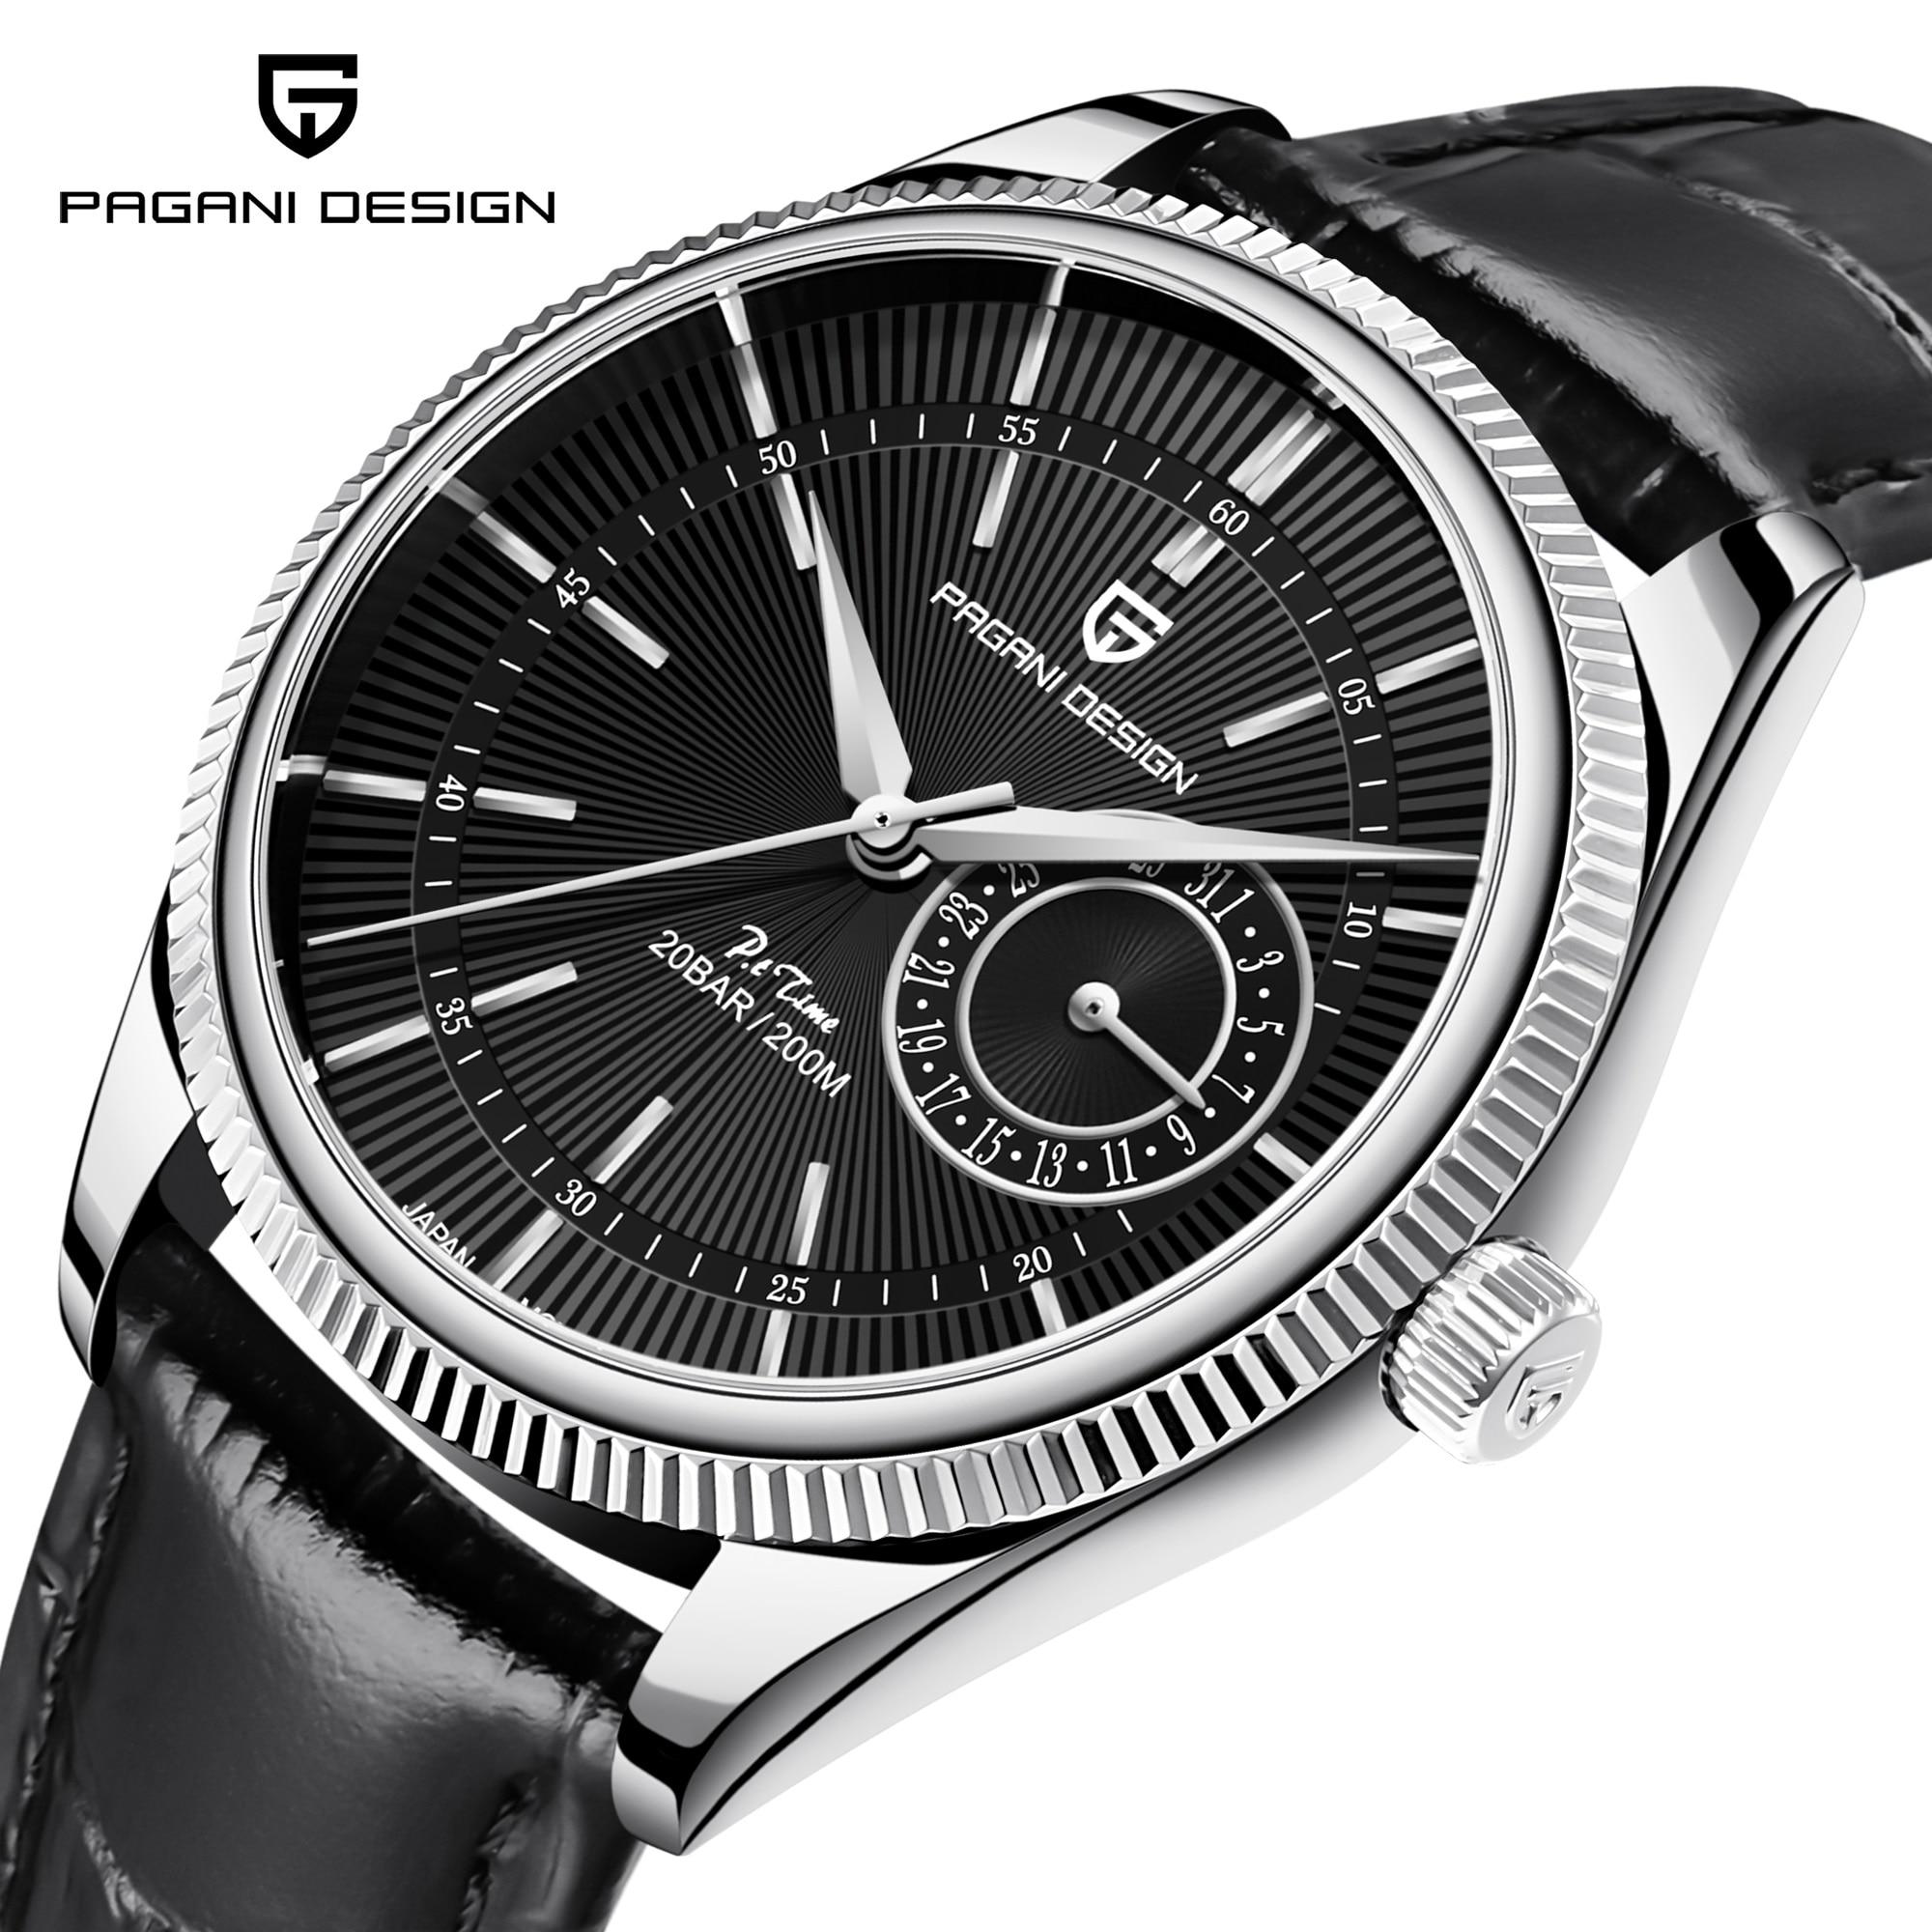 PAGANI تصميم ساعات كوارتز رجالية الياقوت الزجاج العلامة التجارية الفاخرة الساعات الرجال 2021 حزام جلدي أنيق 200 مقاوم للماء